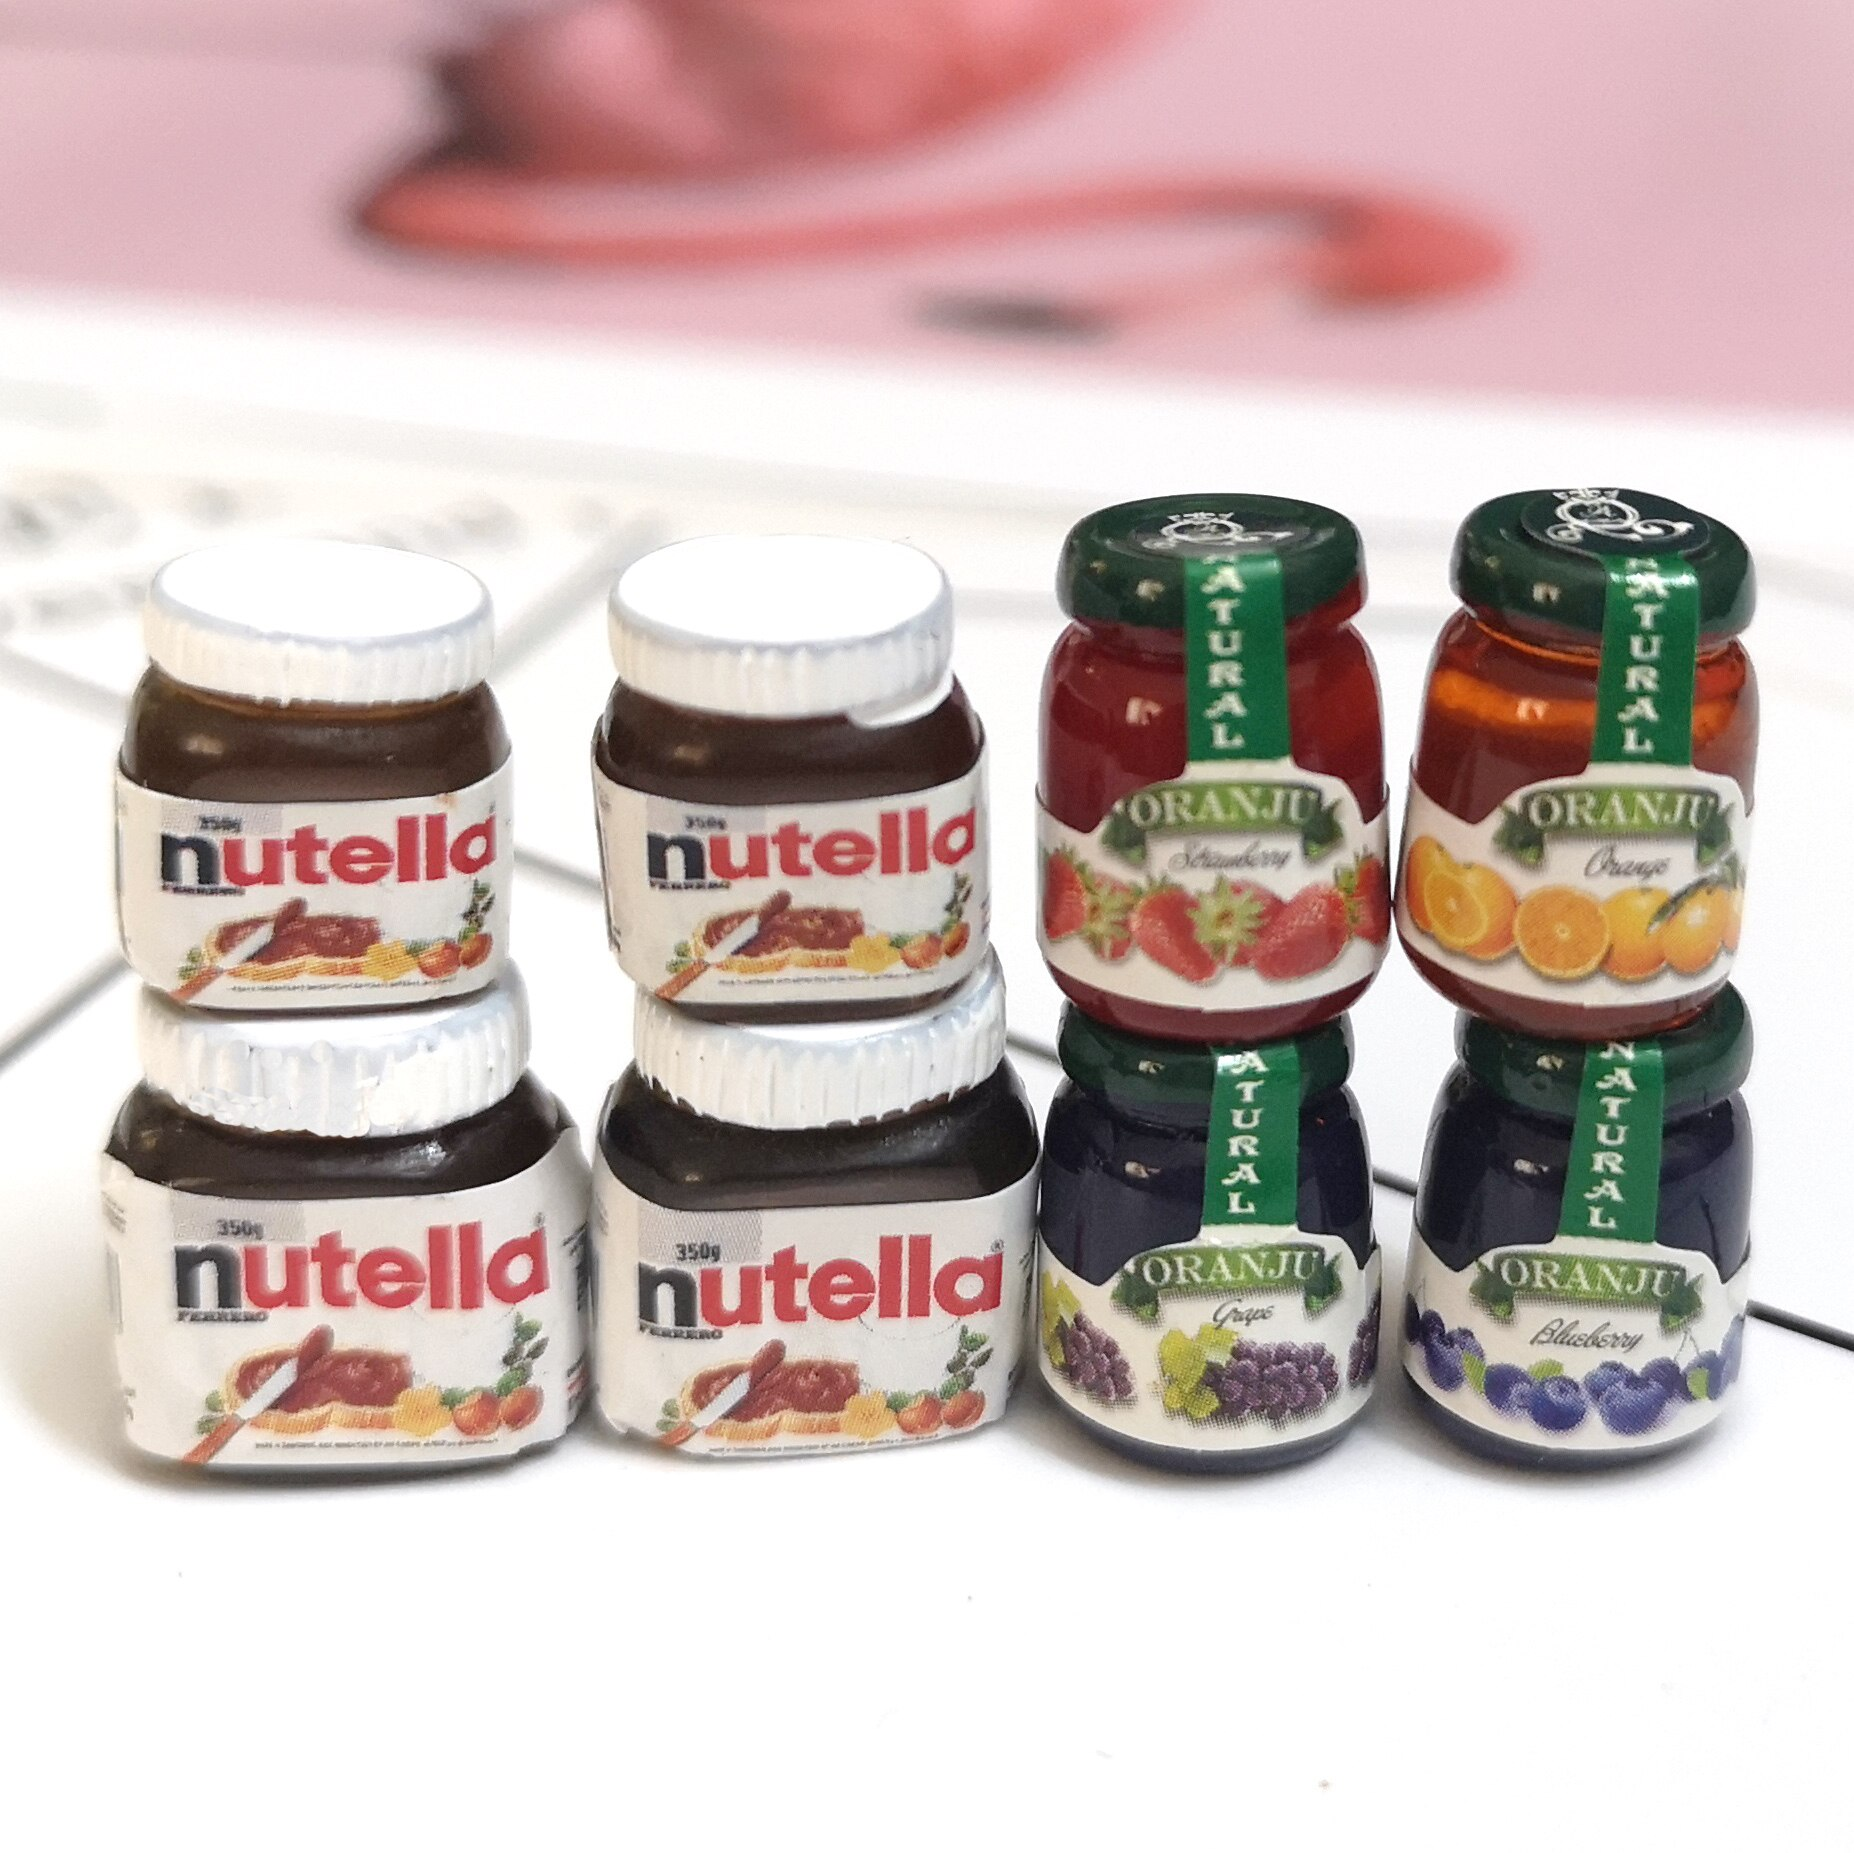 4 Uds 1/12 casa de muñecas Comida en miniatura Mini Chocolate salsa, mermelada juego blyth Pullip OB11 muñeca cocina accesorios de juguete